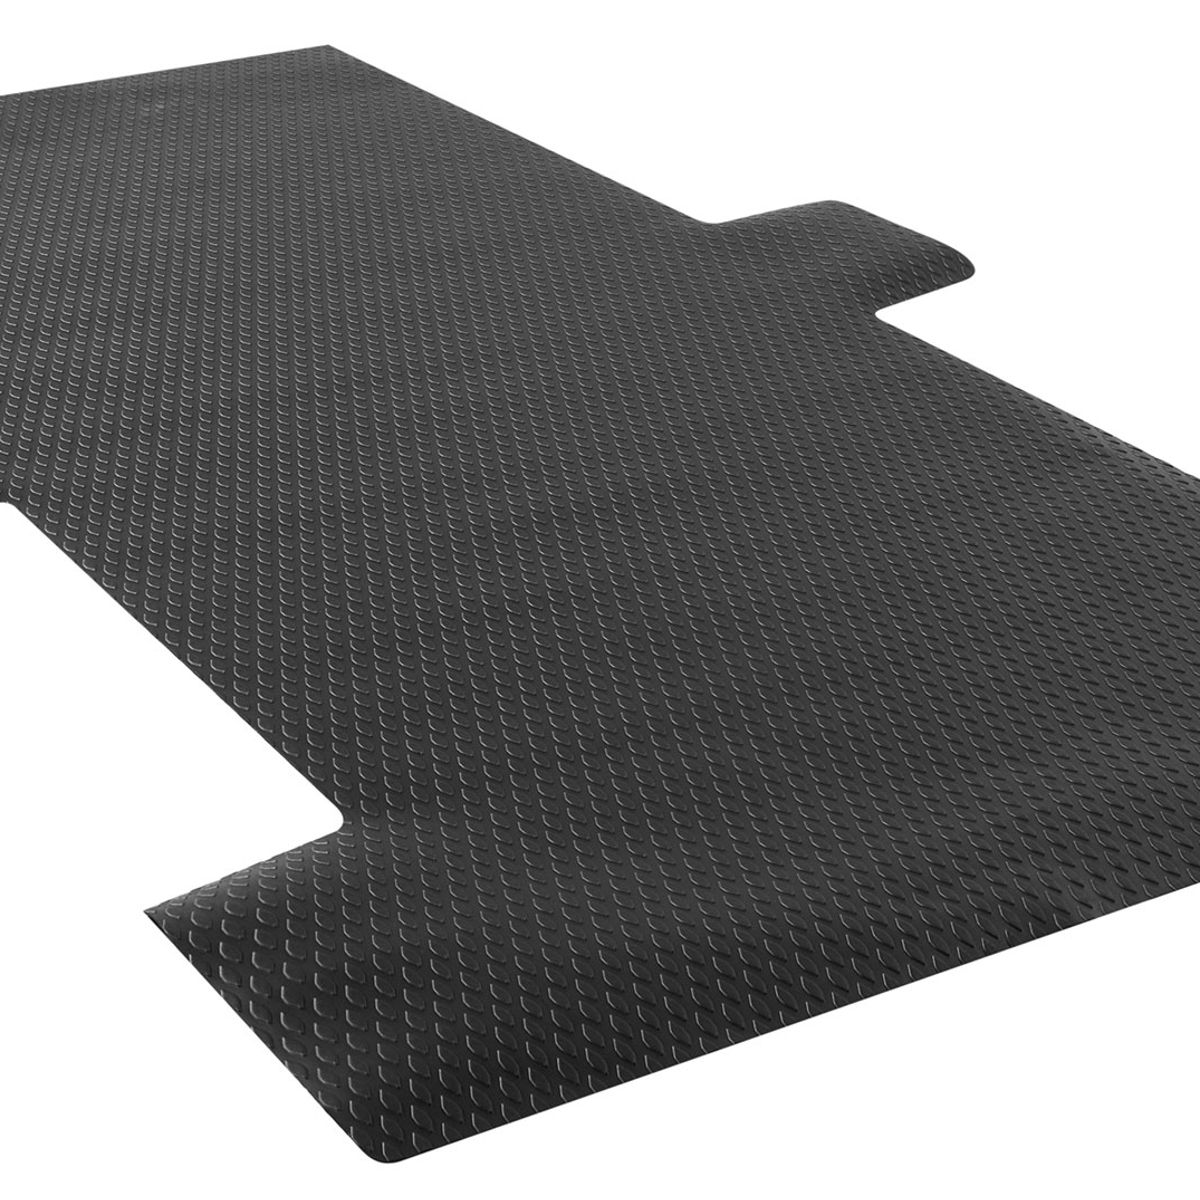 floor mat ford transit 148in wheel base 6203 step ladders werner us [ 1200 x 1200 Pixel ]